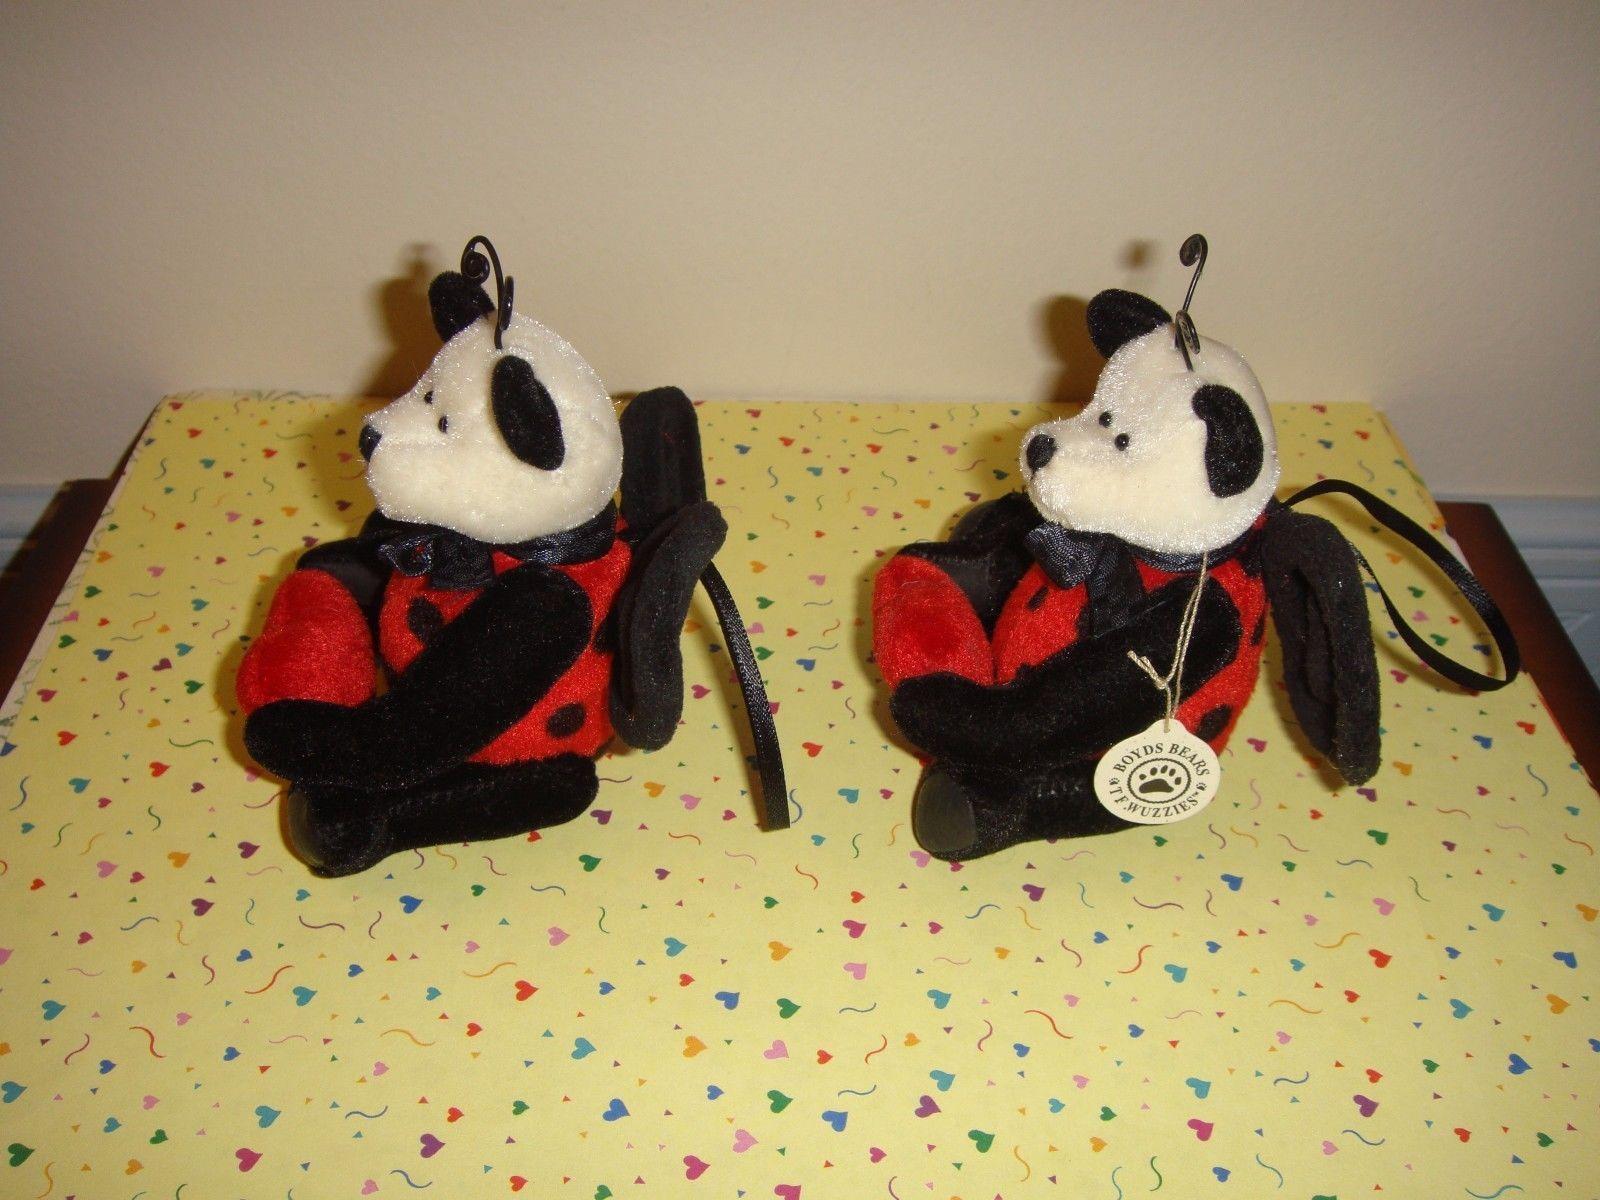 Boyds Bears TF Wuzzies 2 Lady B Lovebug Plush Ornaments